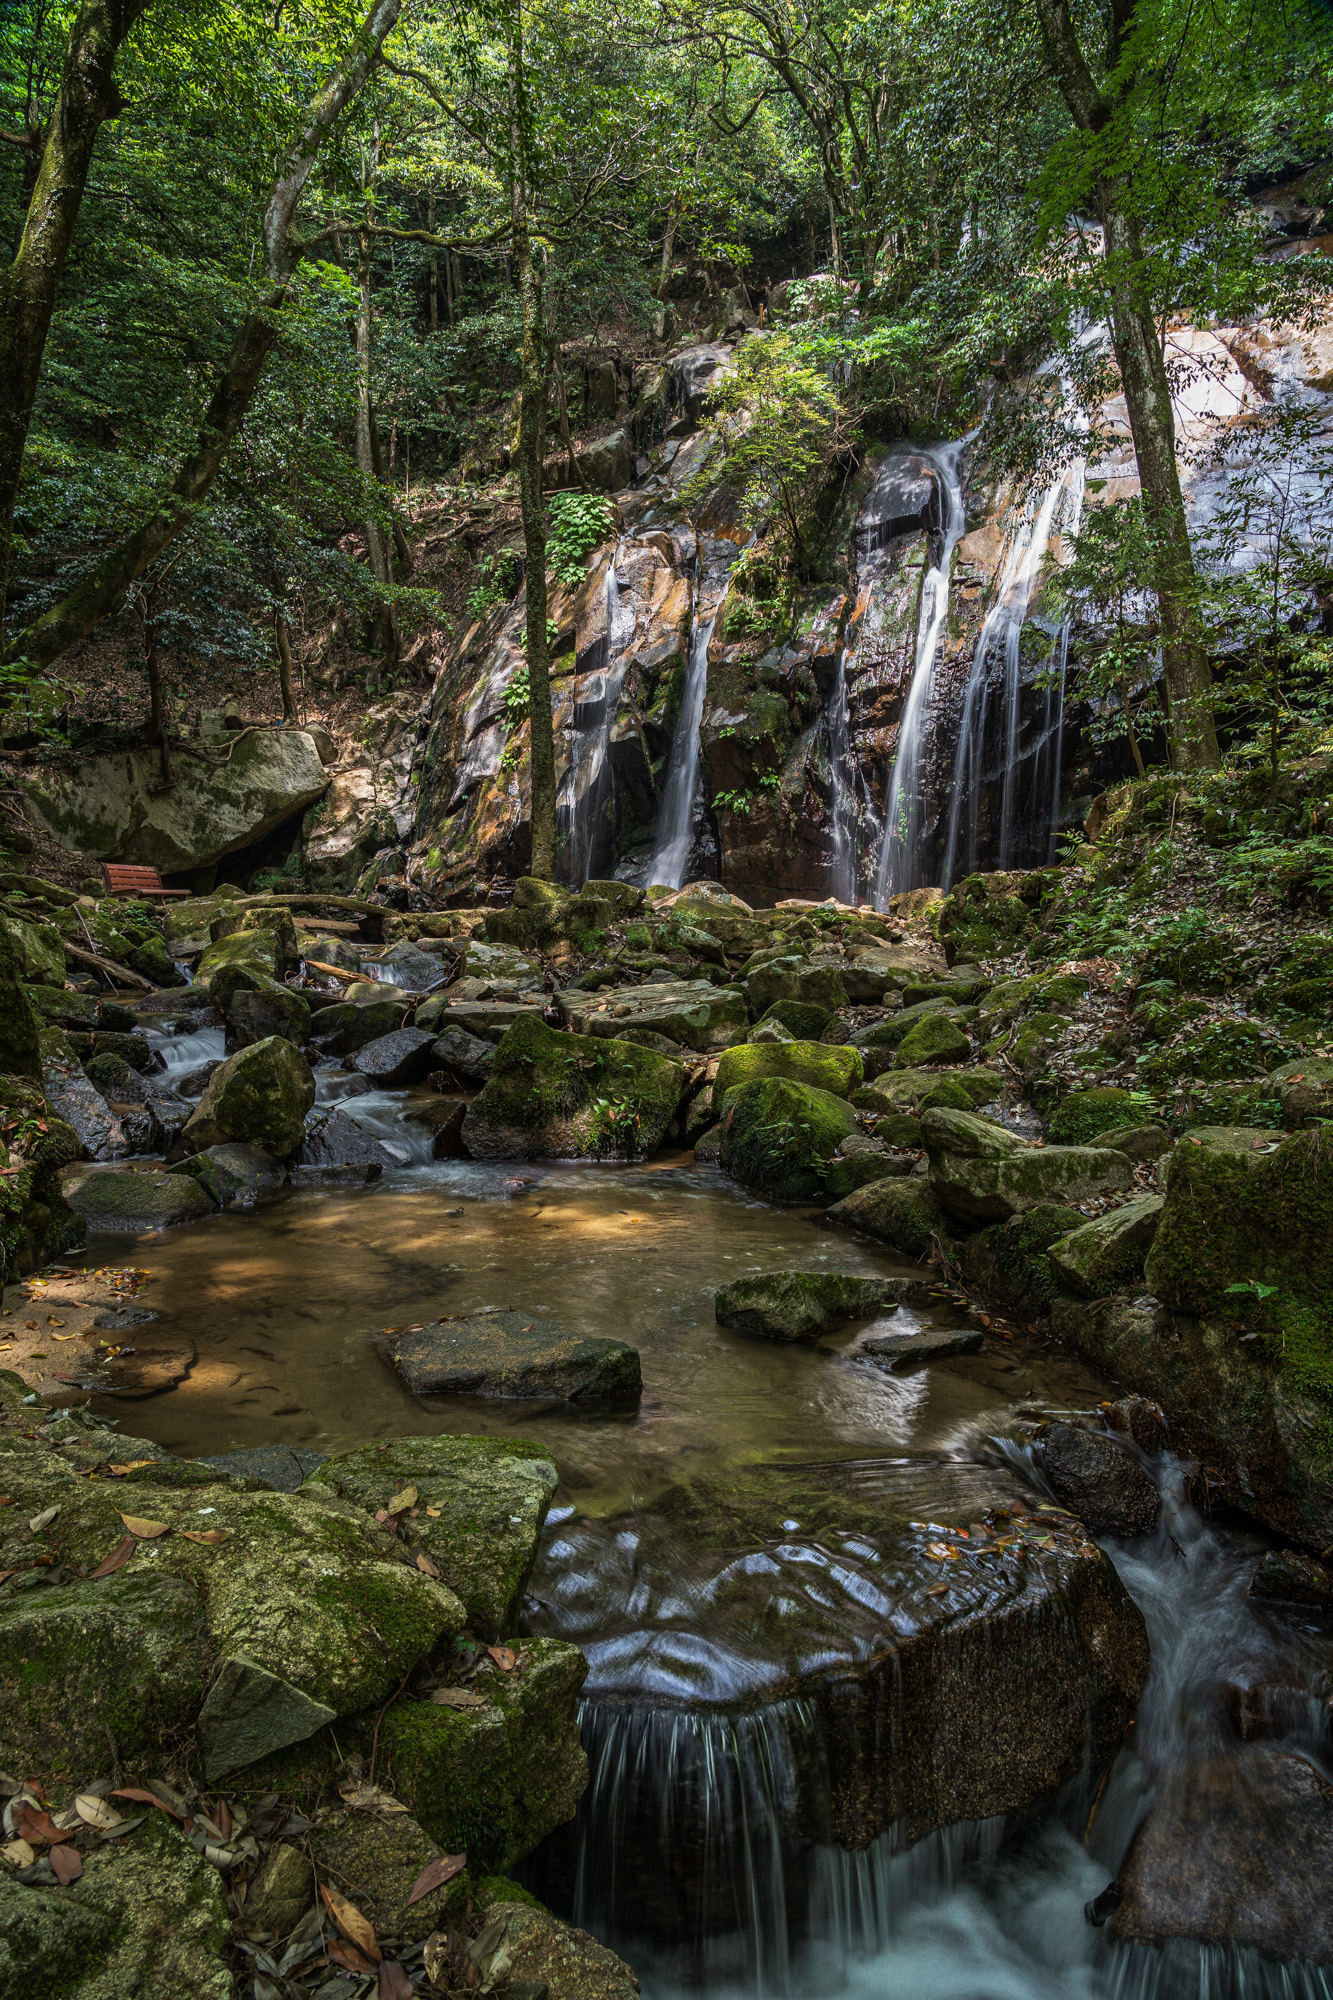 DSC04621-Edit-1 京都 金引の滝(日本の滝百選に選定された秘境の滝スポット!写真の紹介、アクセス情報など)